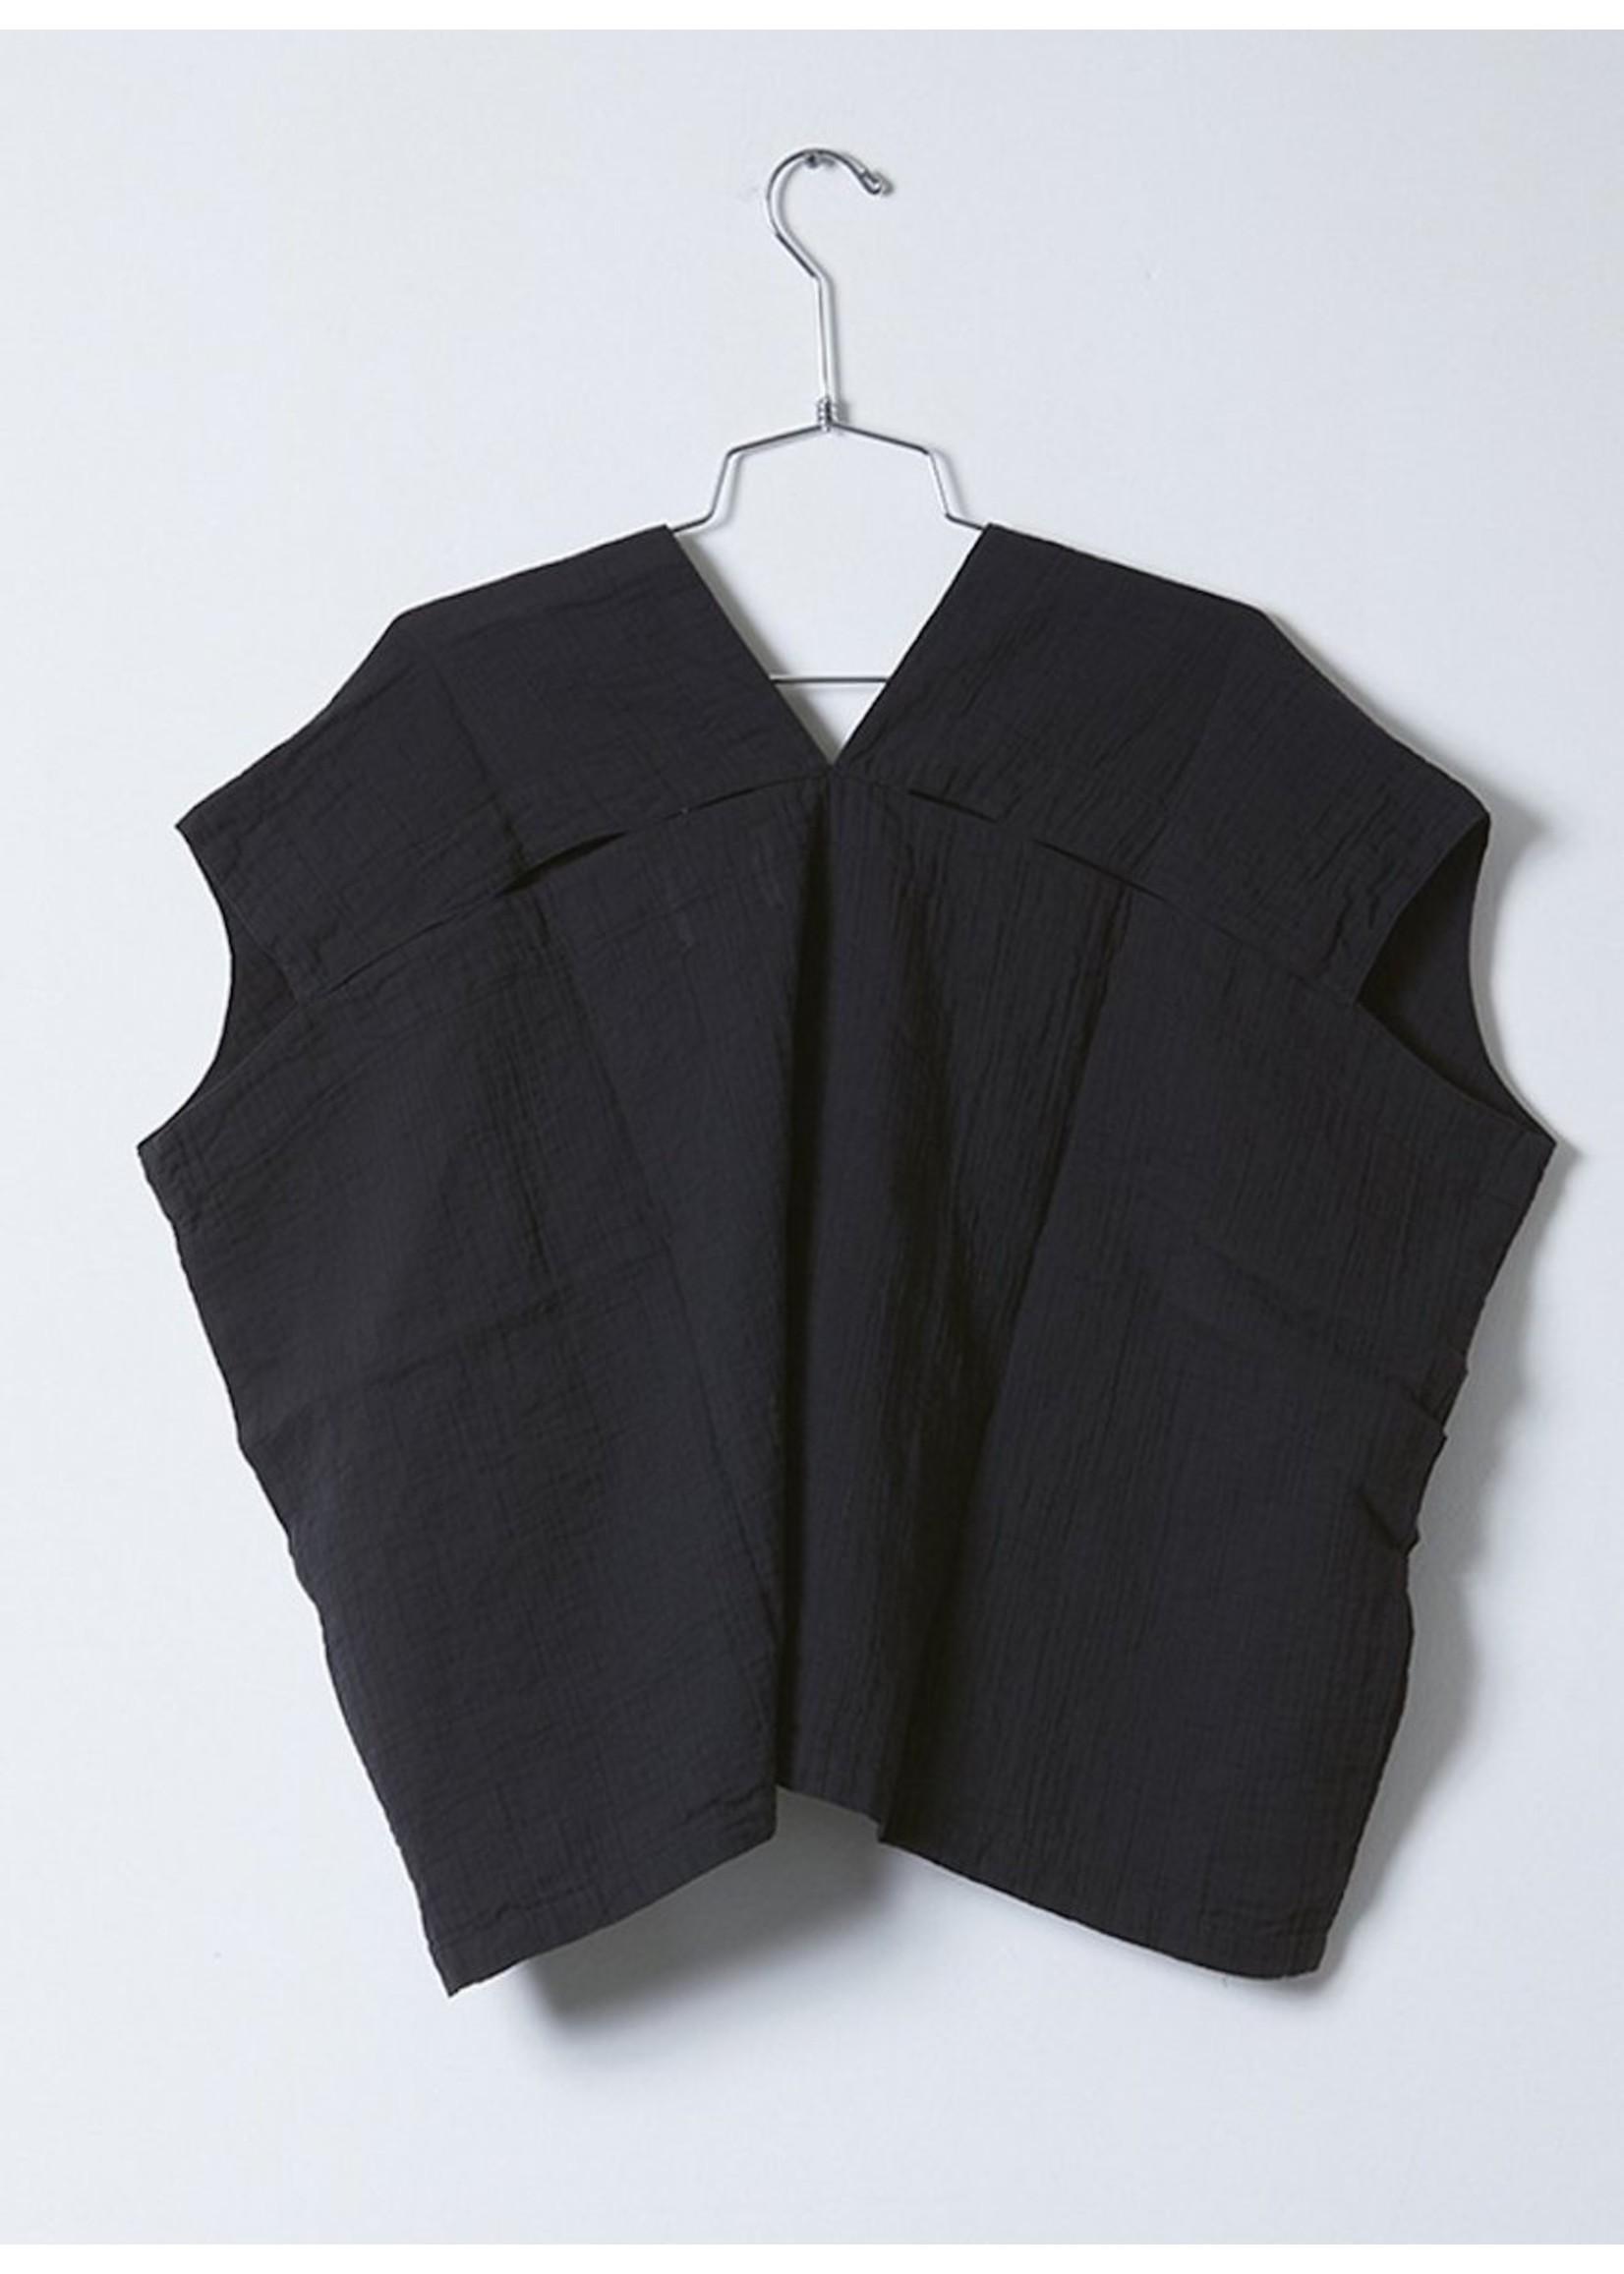 Atelier Delphine Atelier Delphine Black Crinkled Cotton Celeste Top